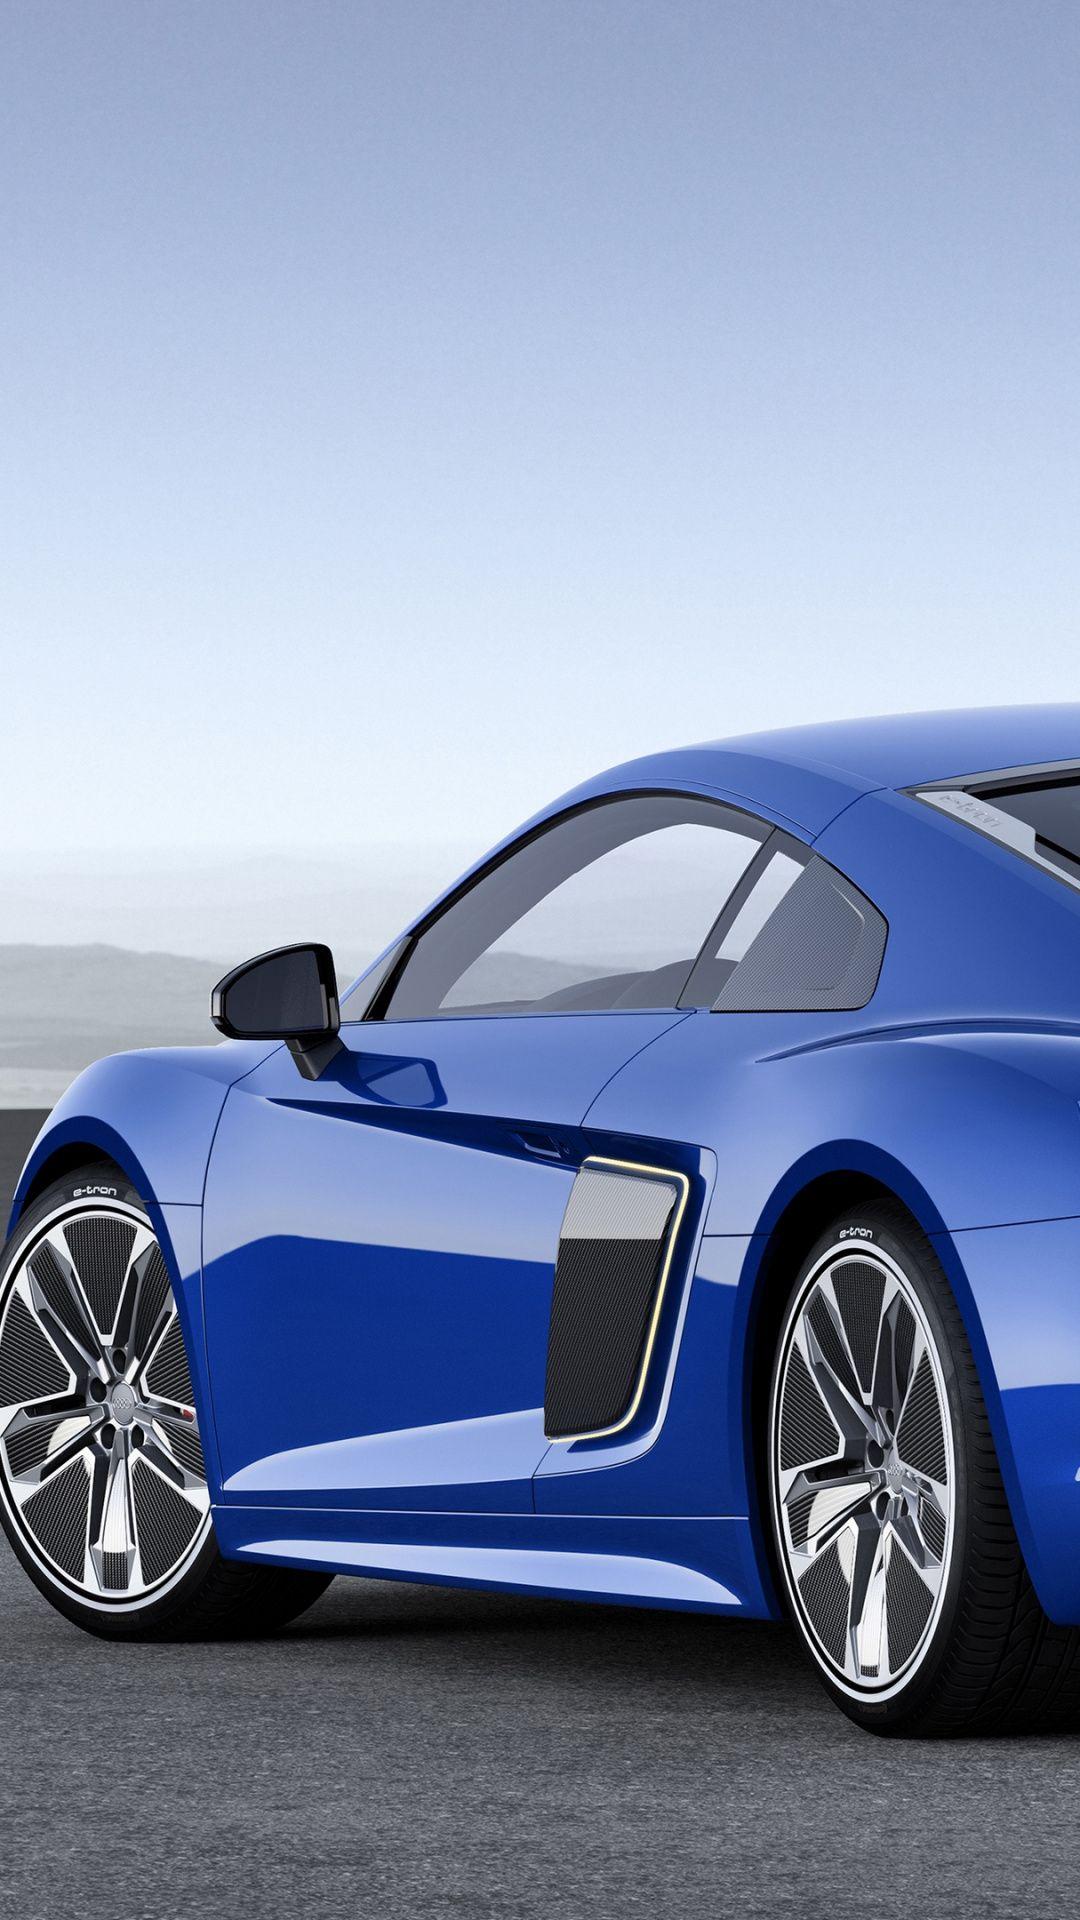 Wallpapers car, audi r8, audi, sportscar, Audi R8 4S